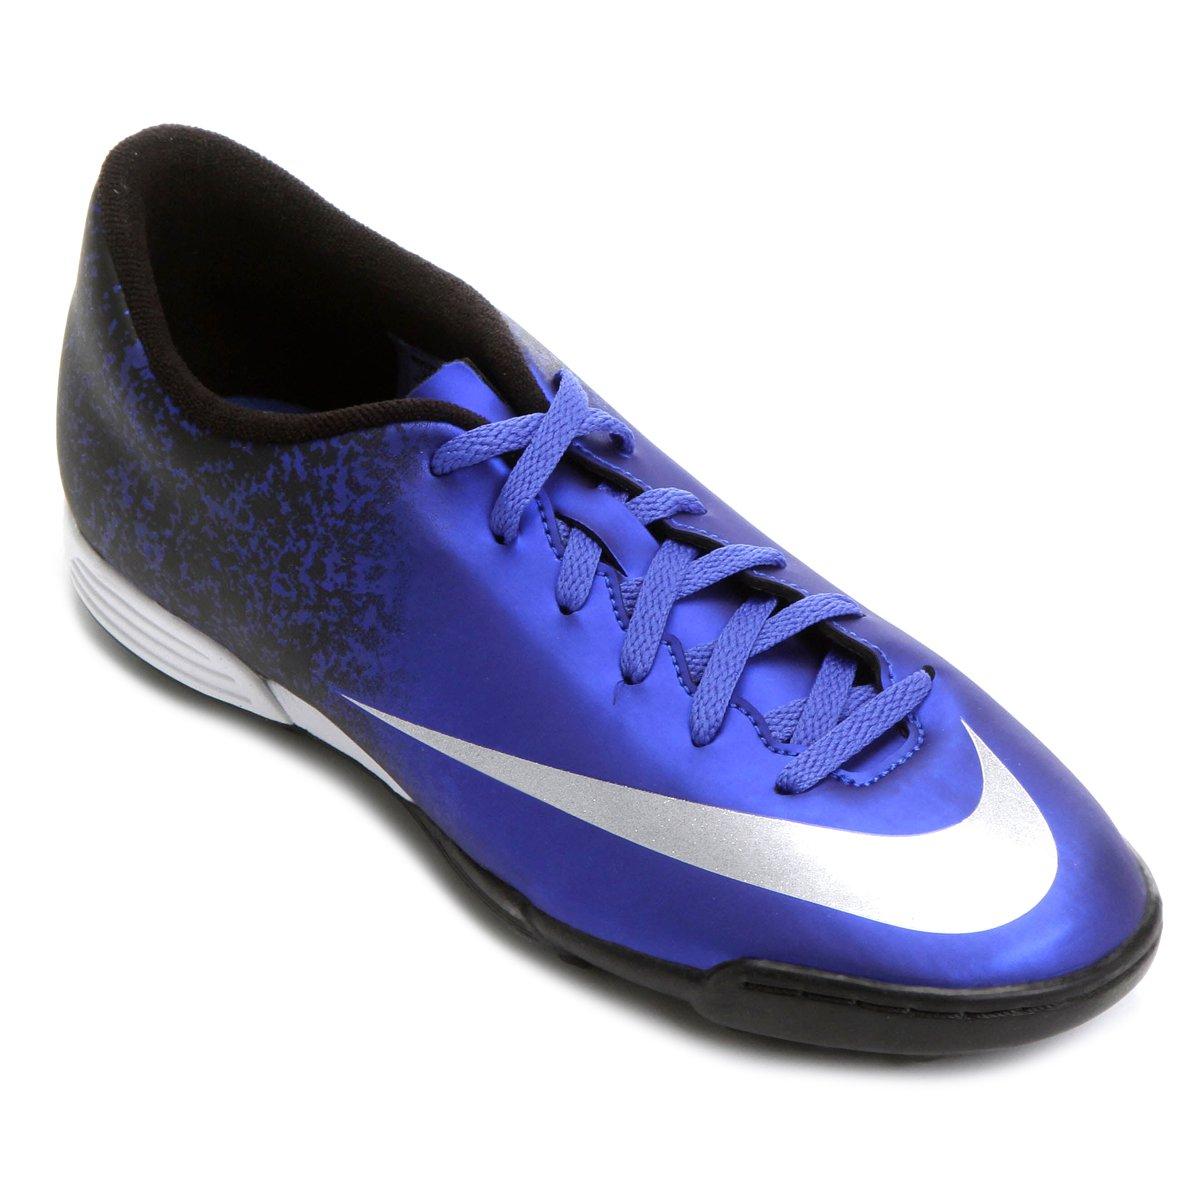 20f91539ec Chuteira Nike Mercurial Vortex 2 CR7 TF Society - Compre Agora ...